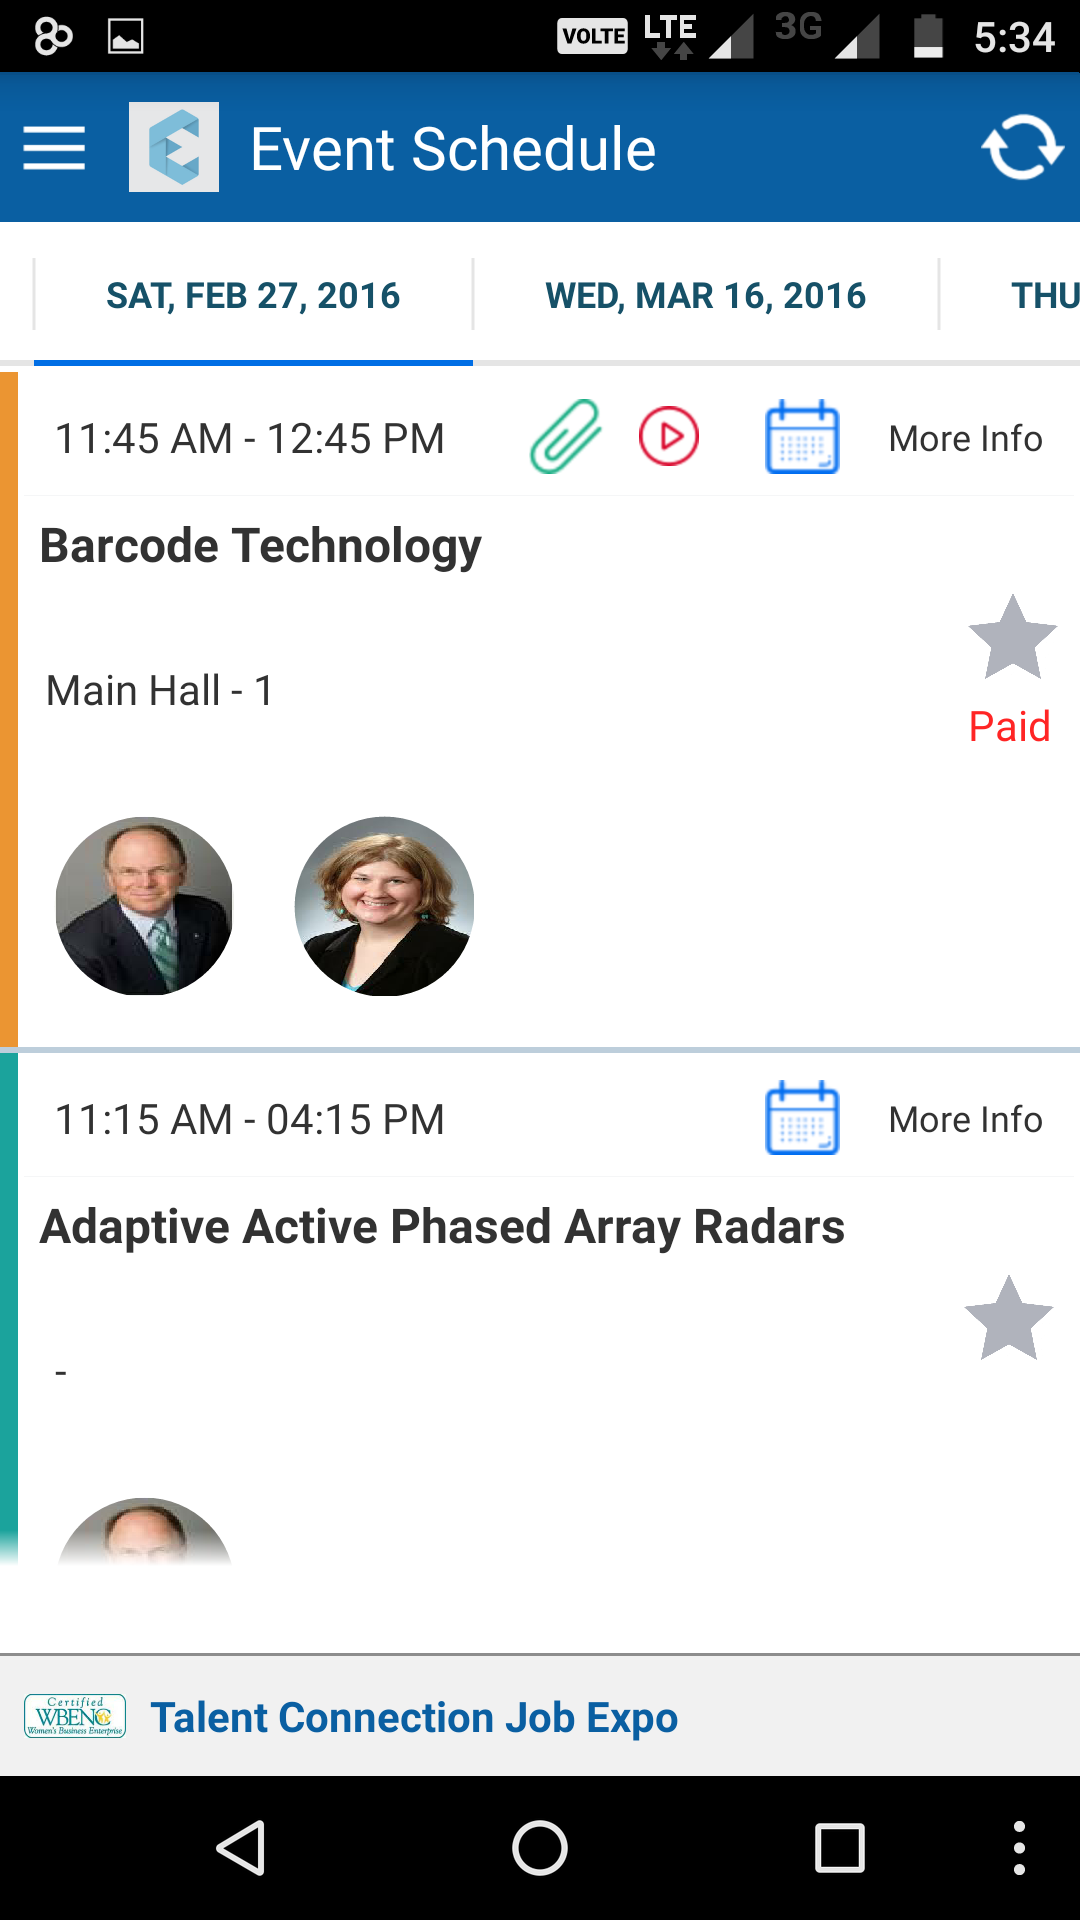 Eventdex Software - Event schedule